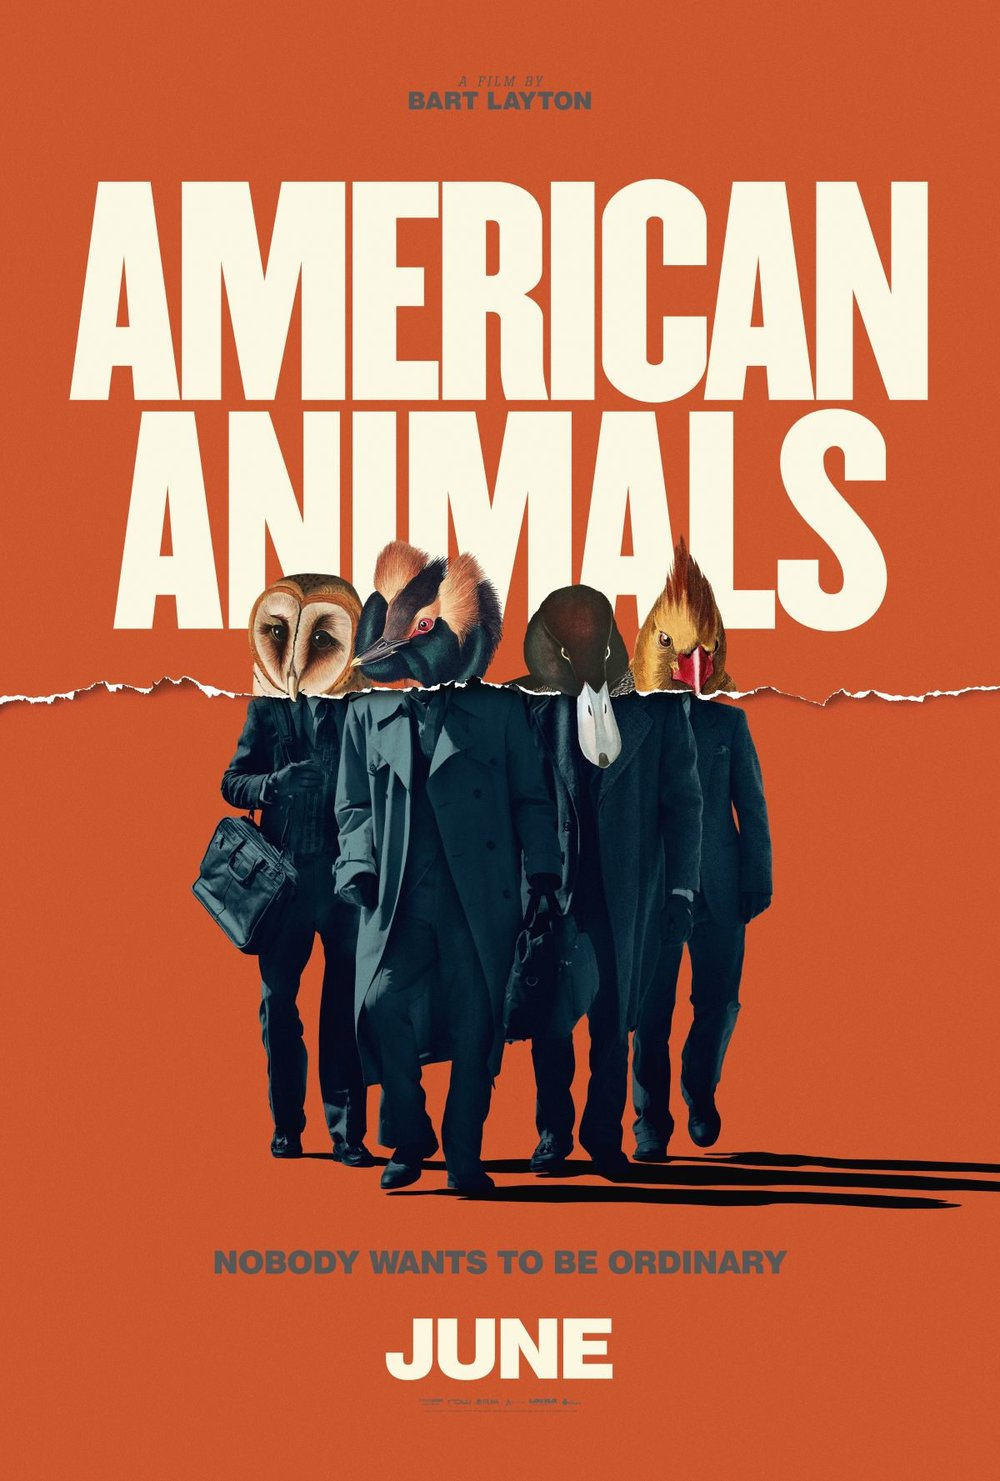 American-Animals-Poster-1_1200_1777_81_s.jpg